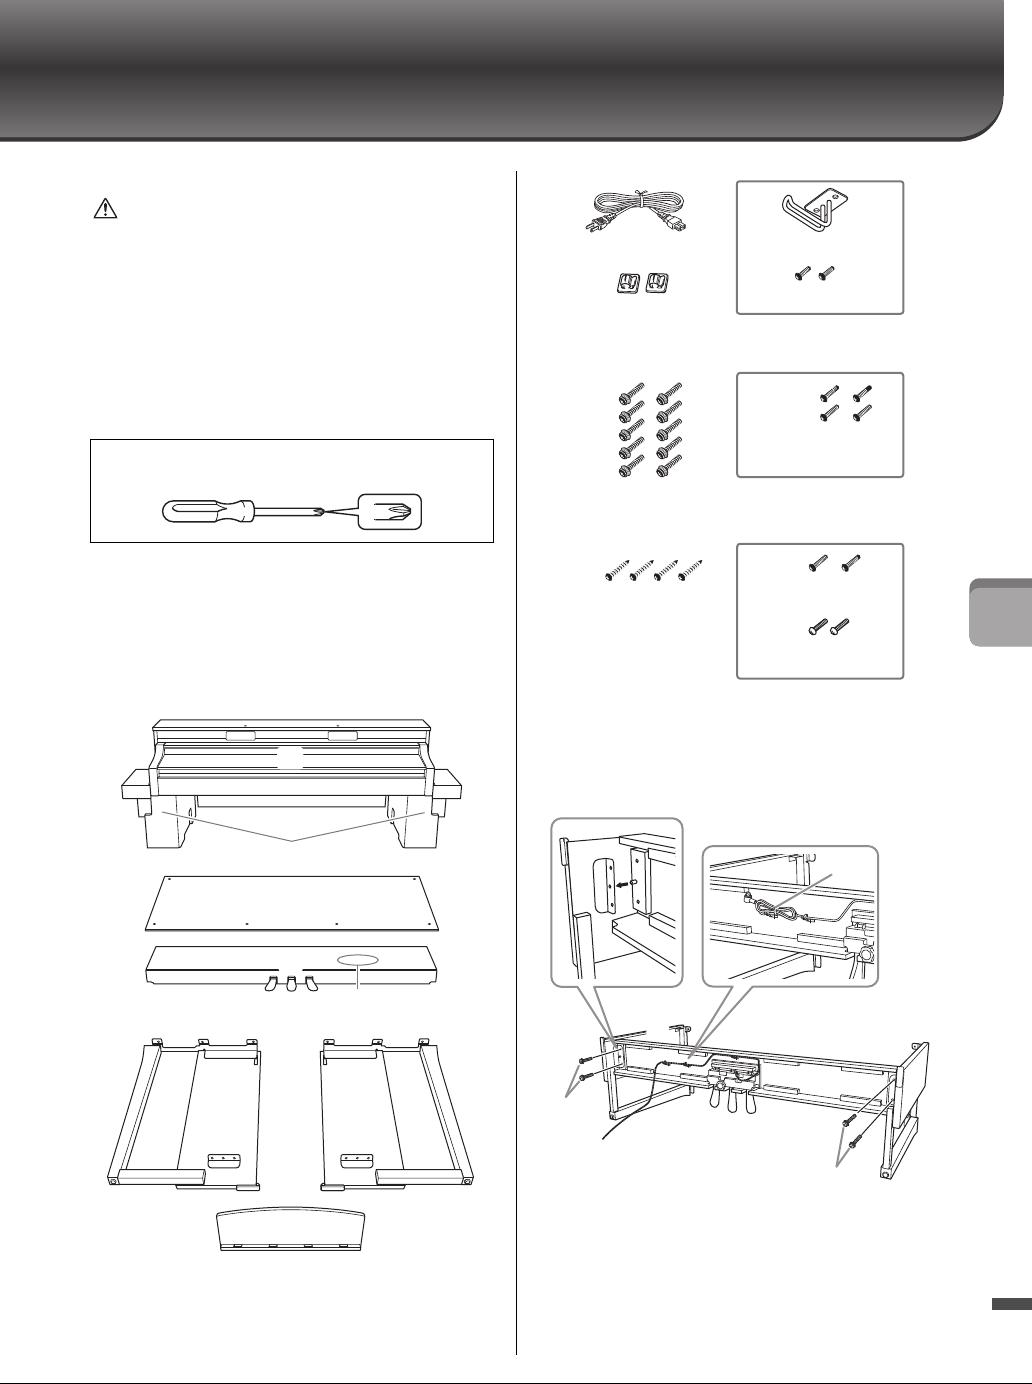 Yamaha Csp 170 150 Owners Manual Csp170 En Om B0 4x12 Speaker Cabinet Wiring Stereo Mono Google Groups 35